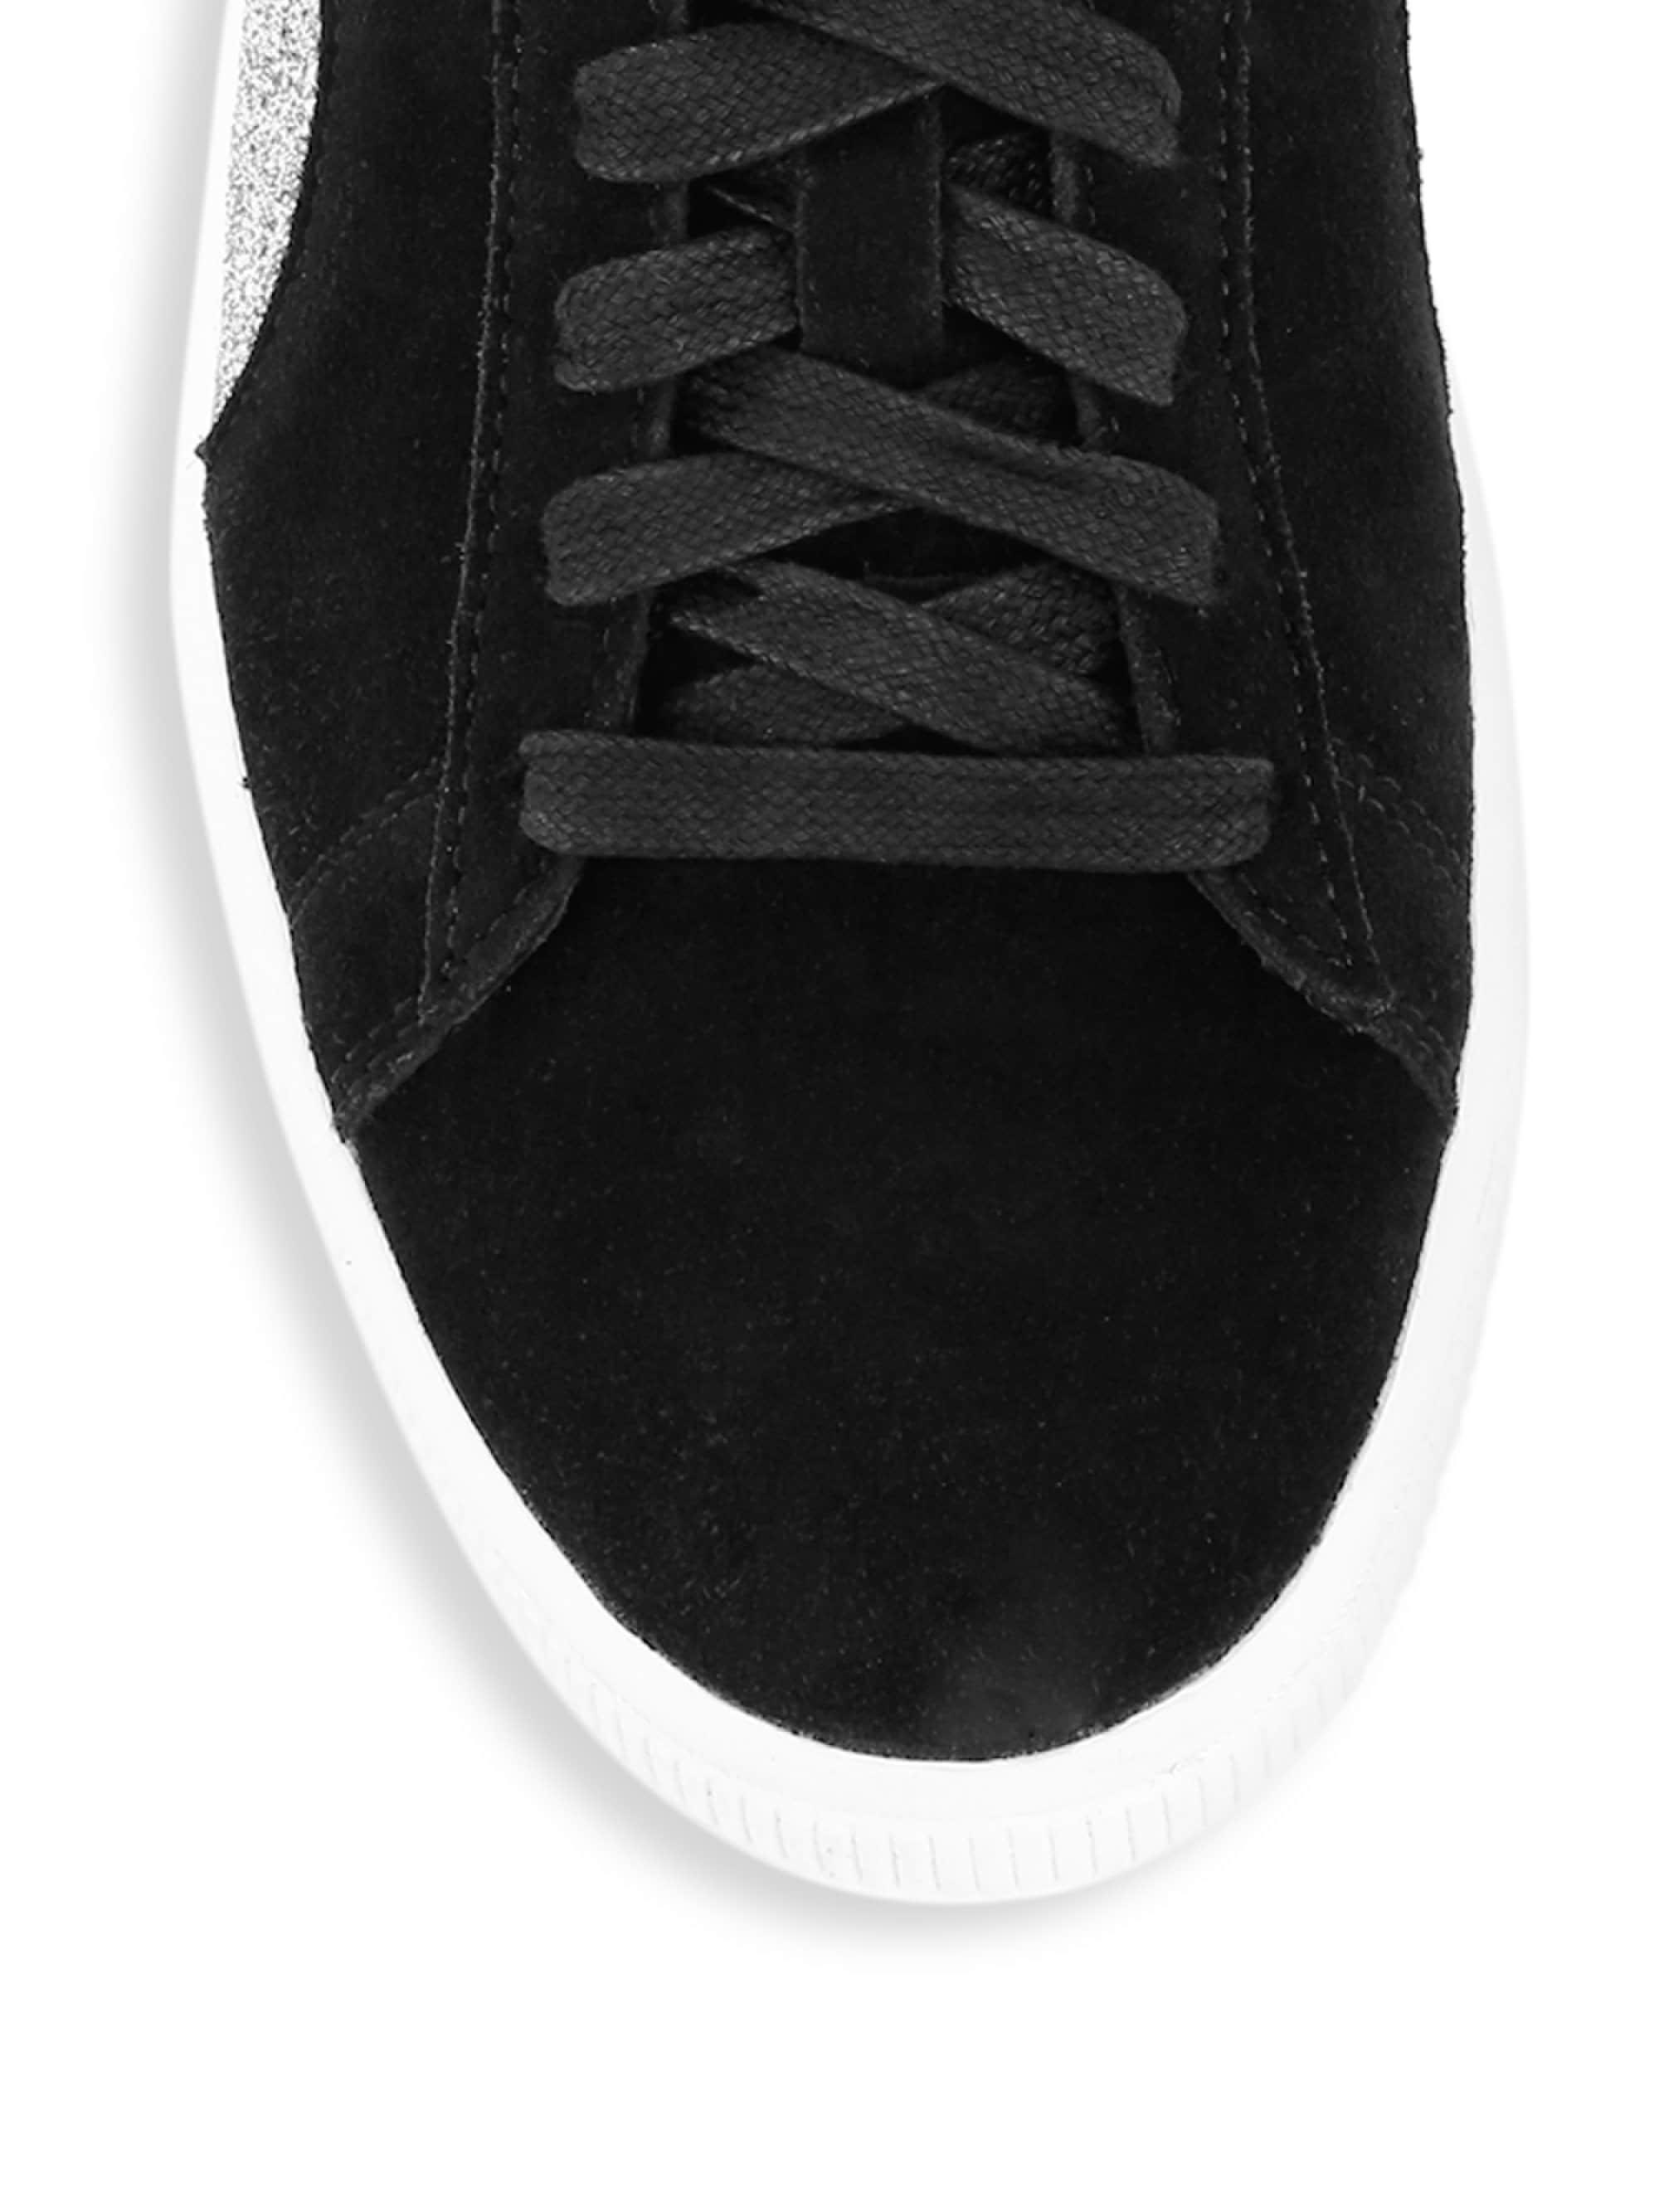 Lyst - PUMA X Swarovski Suede Sneakers in Black 42ba4bda8